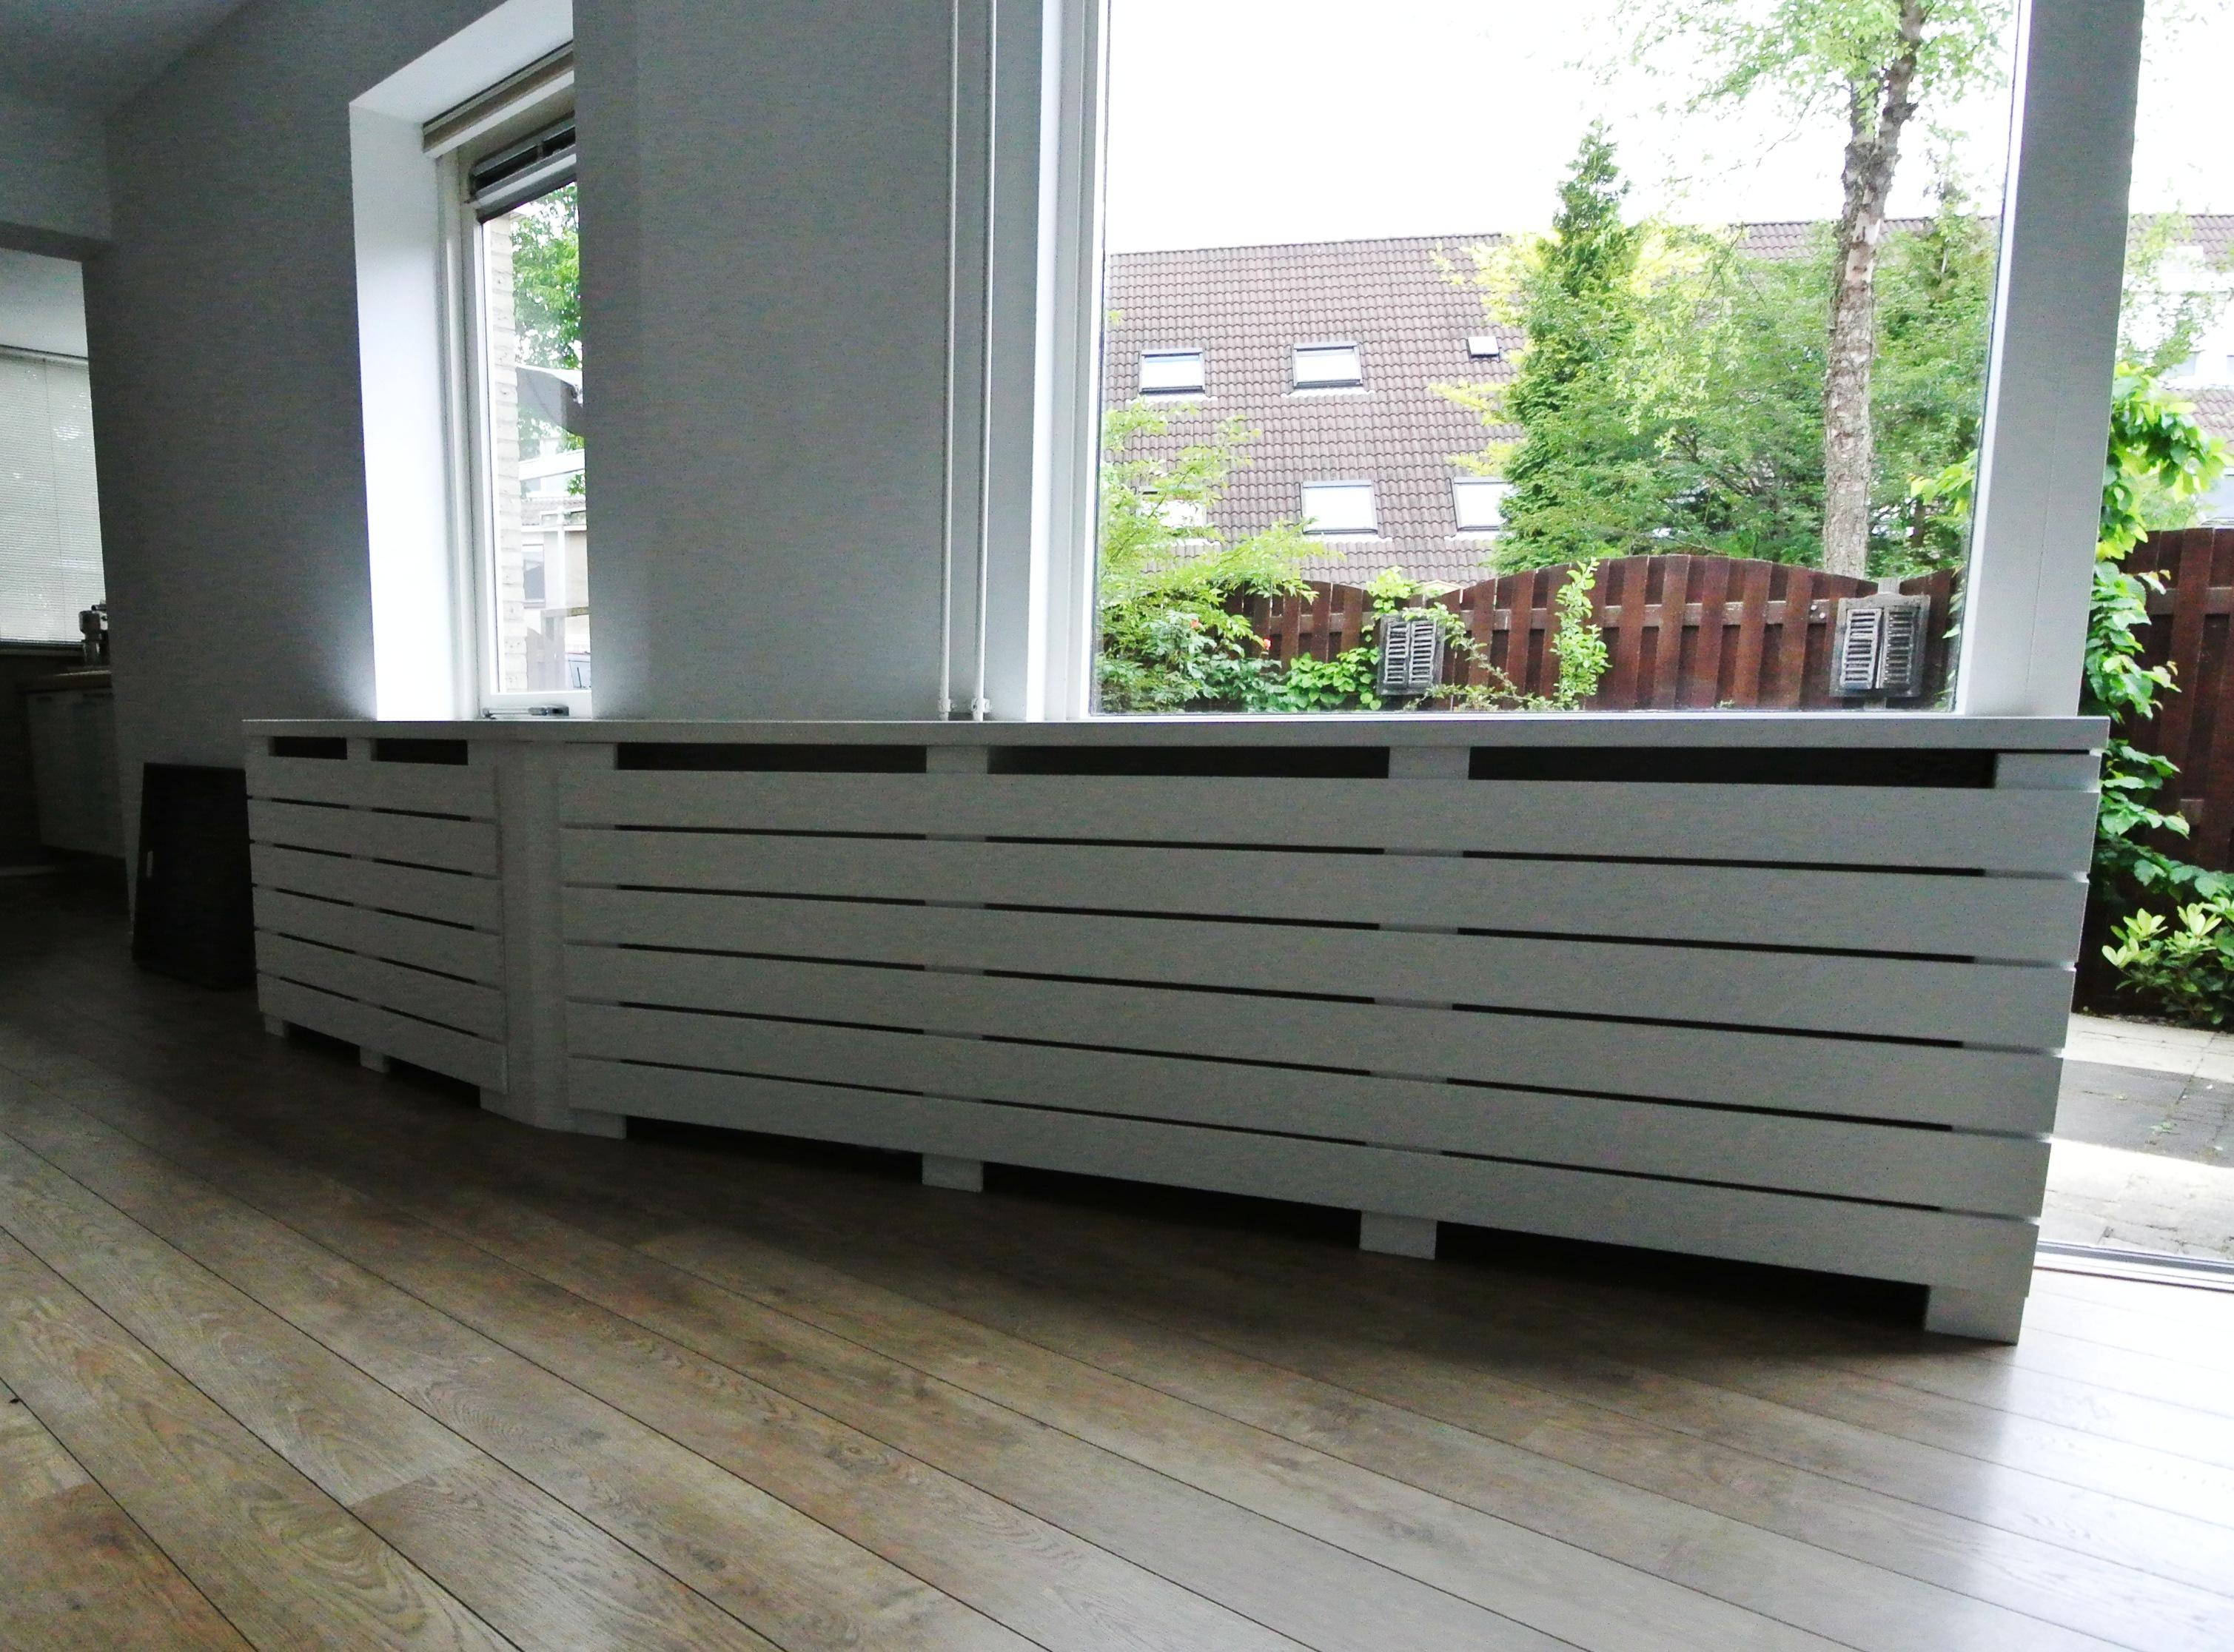 radiatorbekleding met lattex